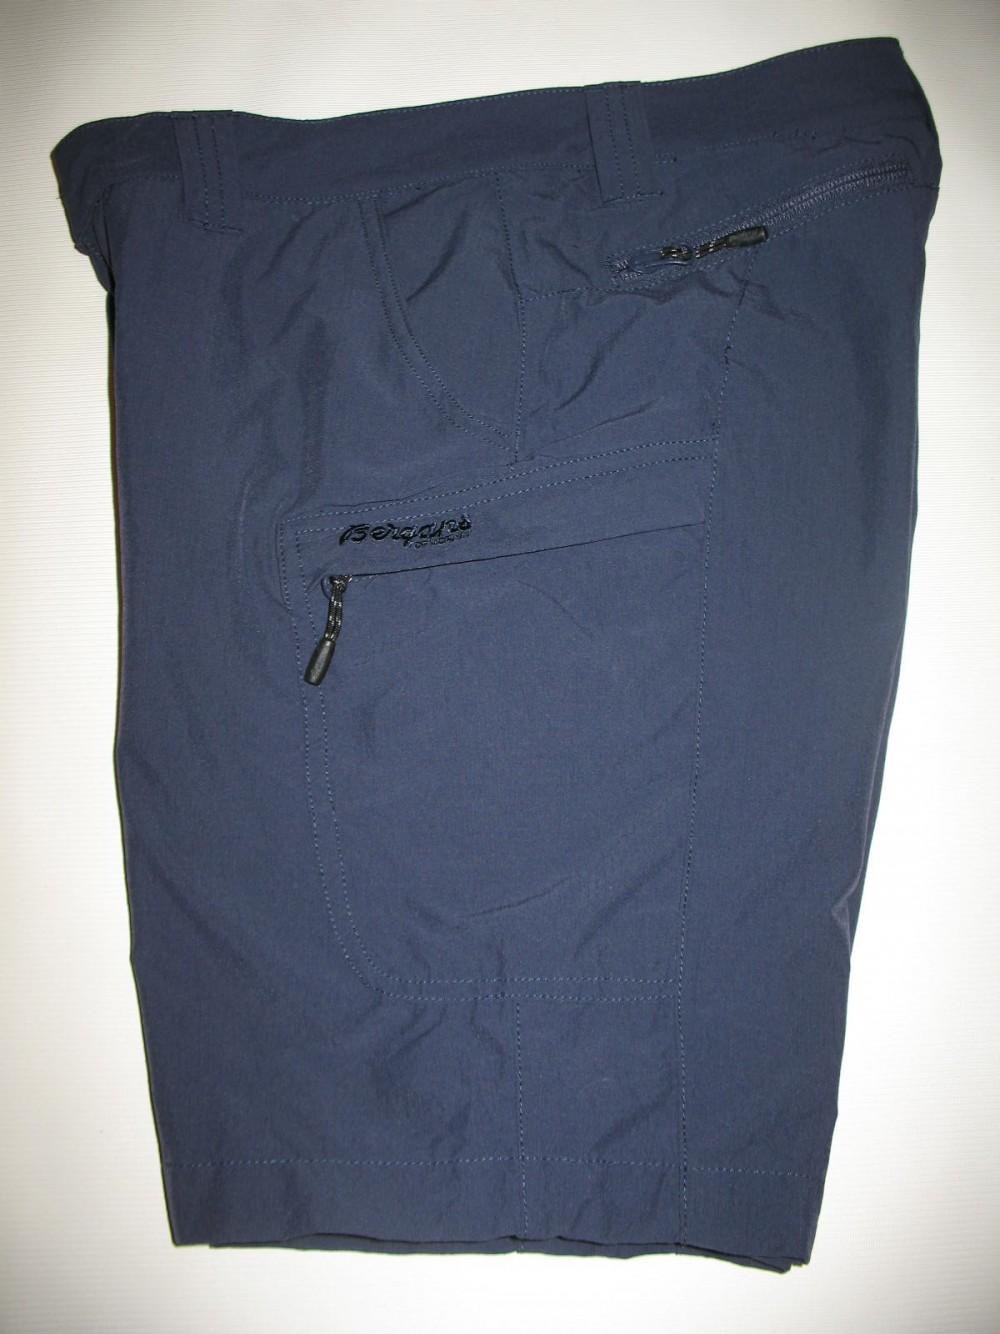 Шорты BERGANS 9966 outdoor shorts lady (размер S) - 1